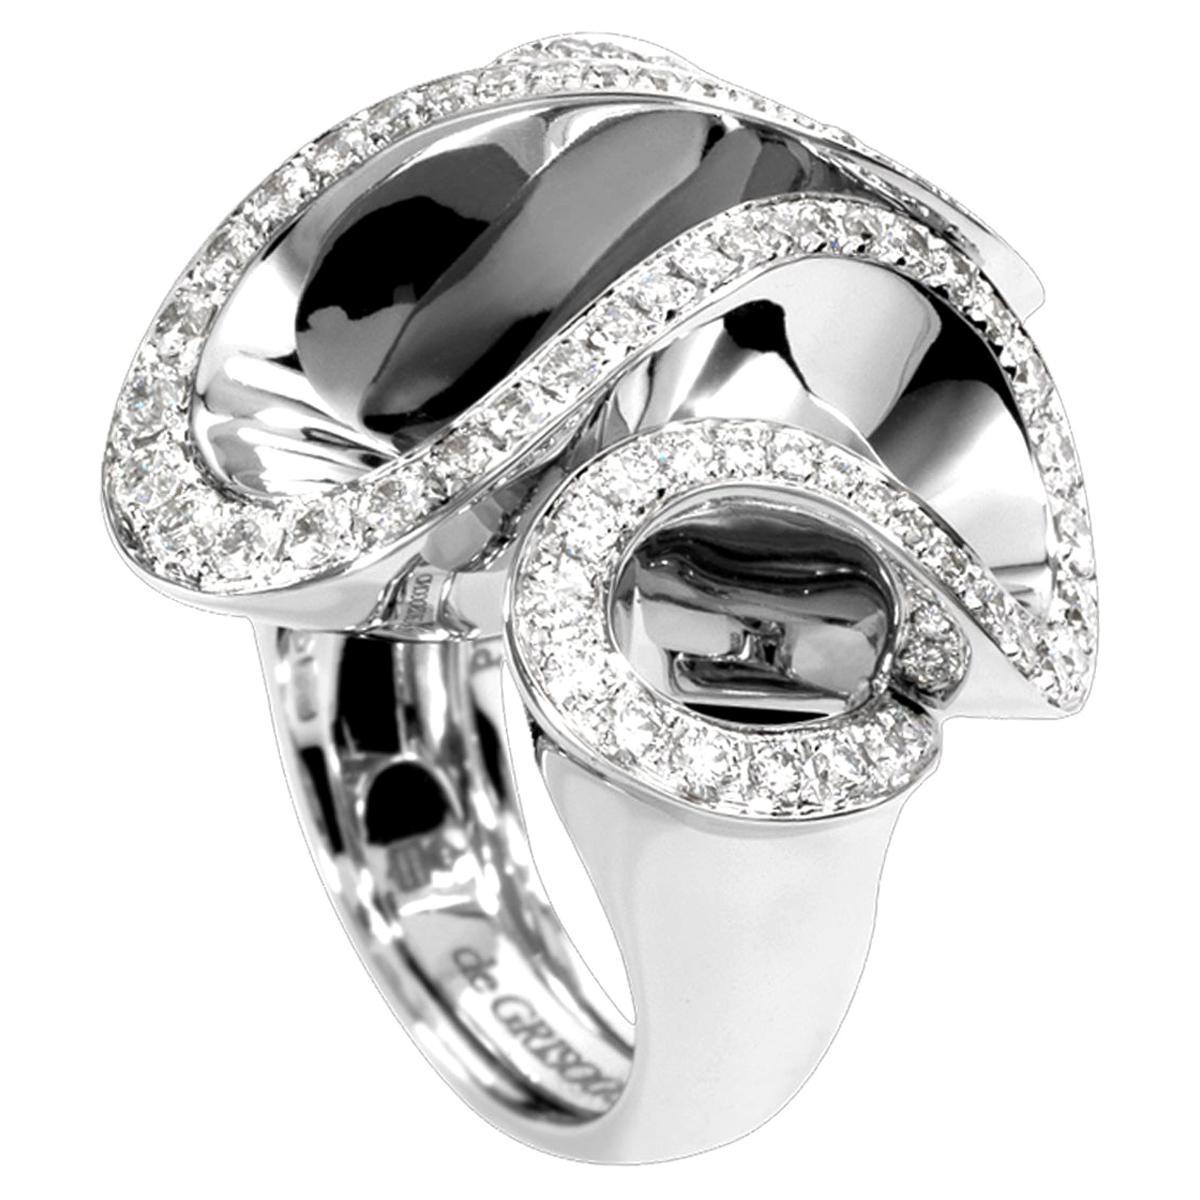 De Grisogono White Gold Diamond Cocktail Ring